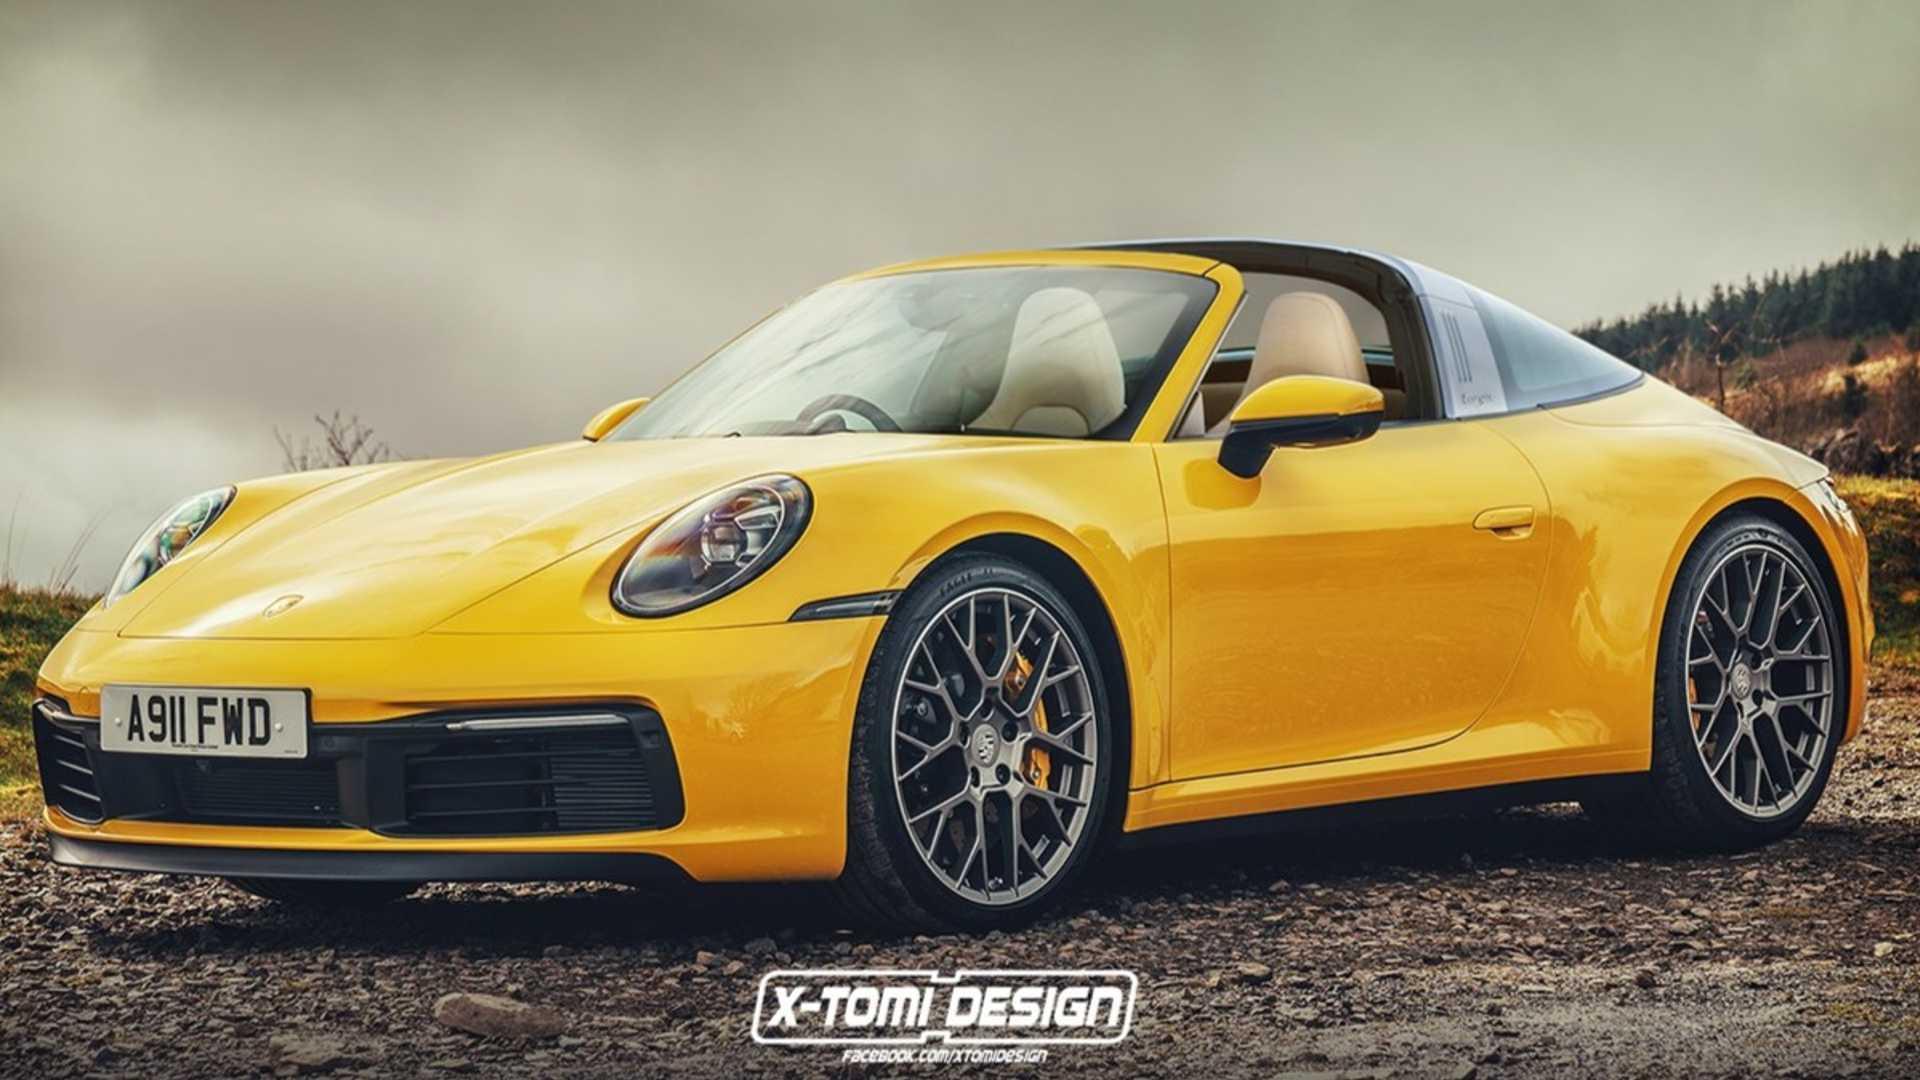 Porsche 911 Targa 4s Rendering Offers Preview Ahead Of Upcoming Debut